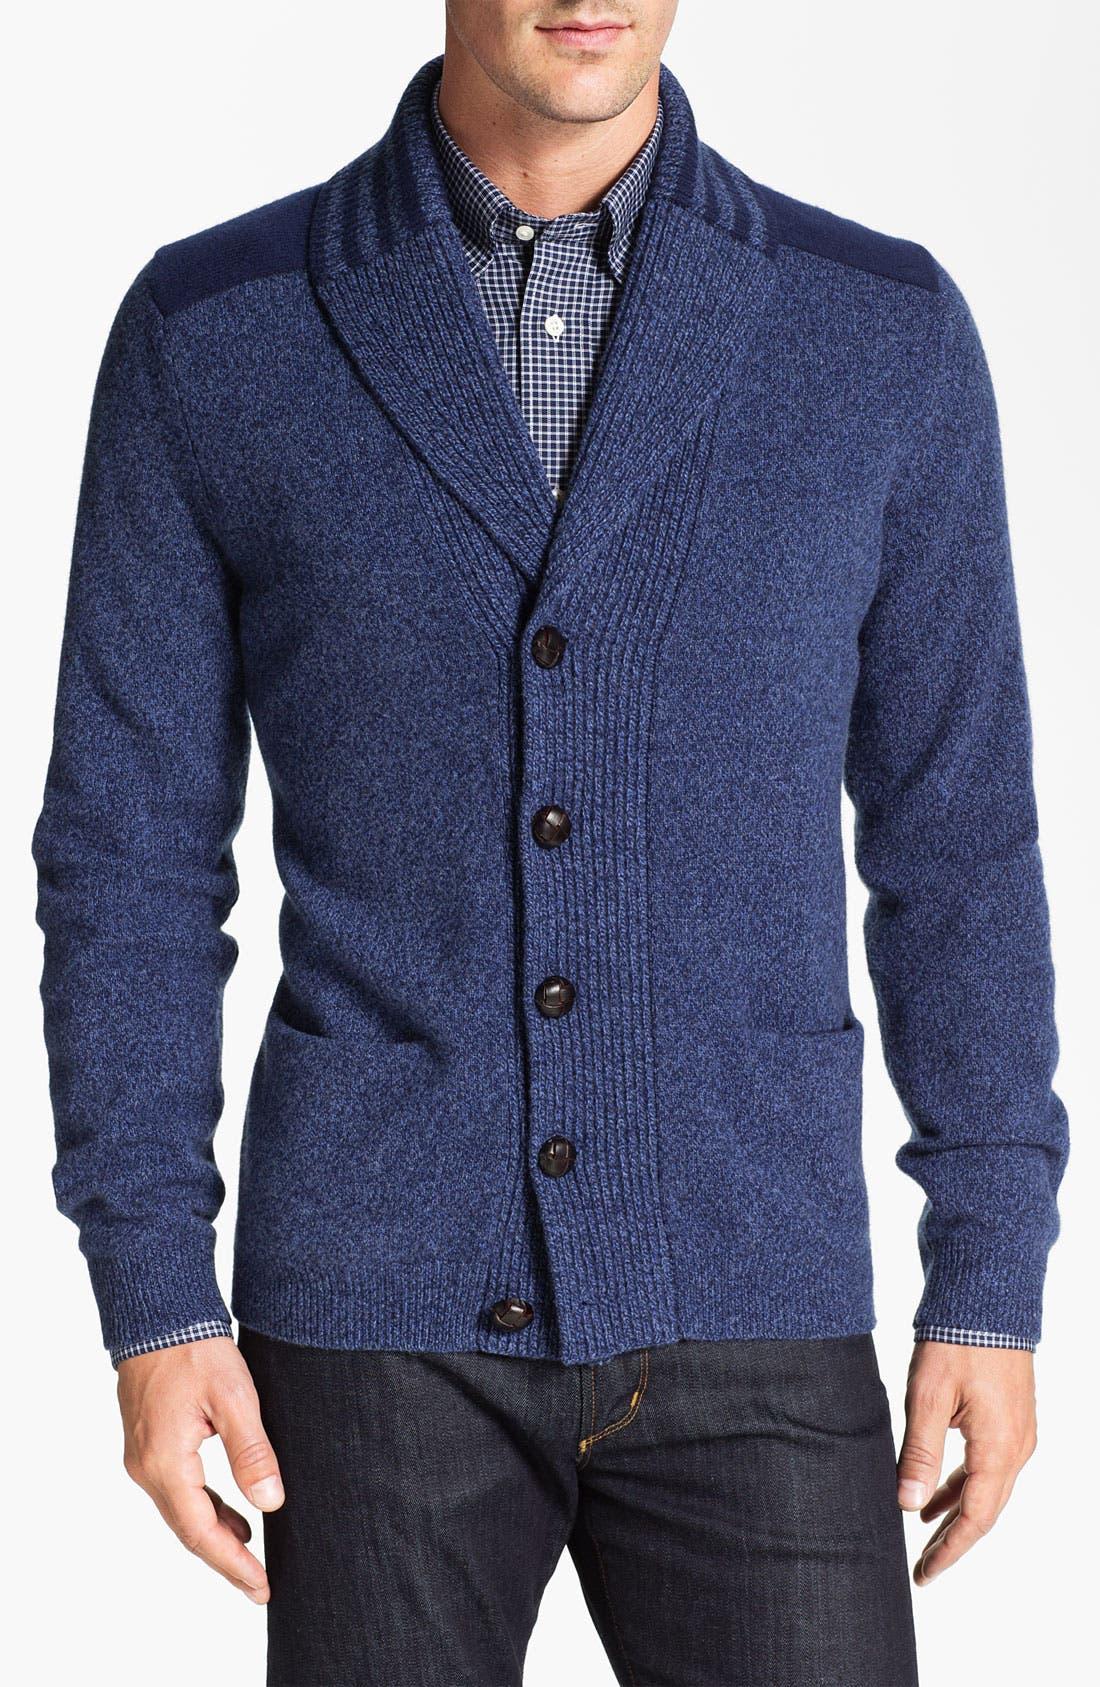 Alternate Image 1 Selected - Façonnable Shawl Collar Wool Cardigan